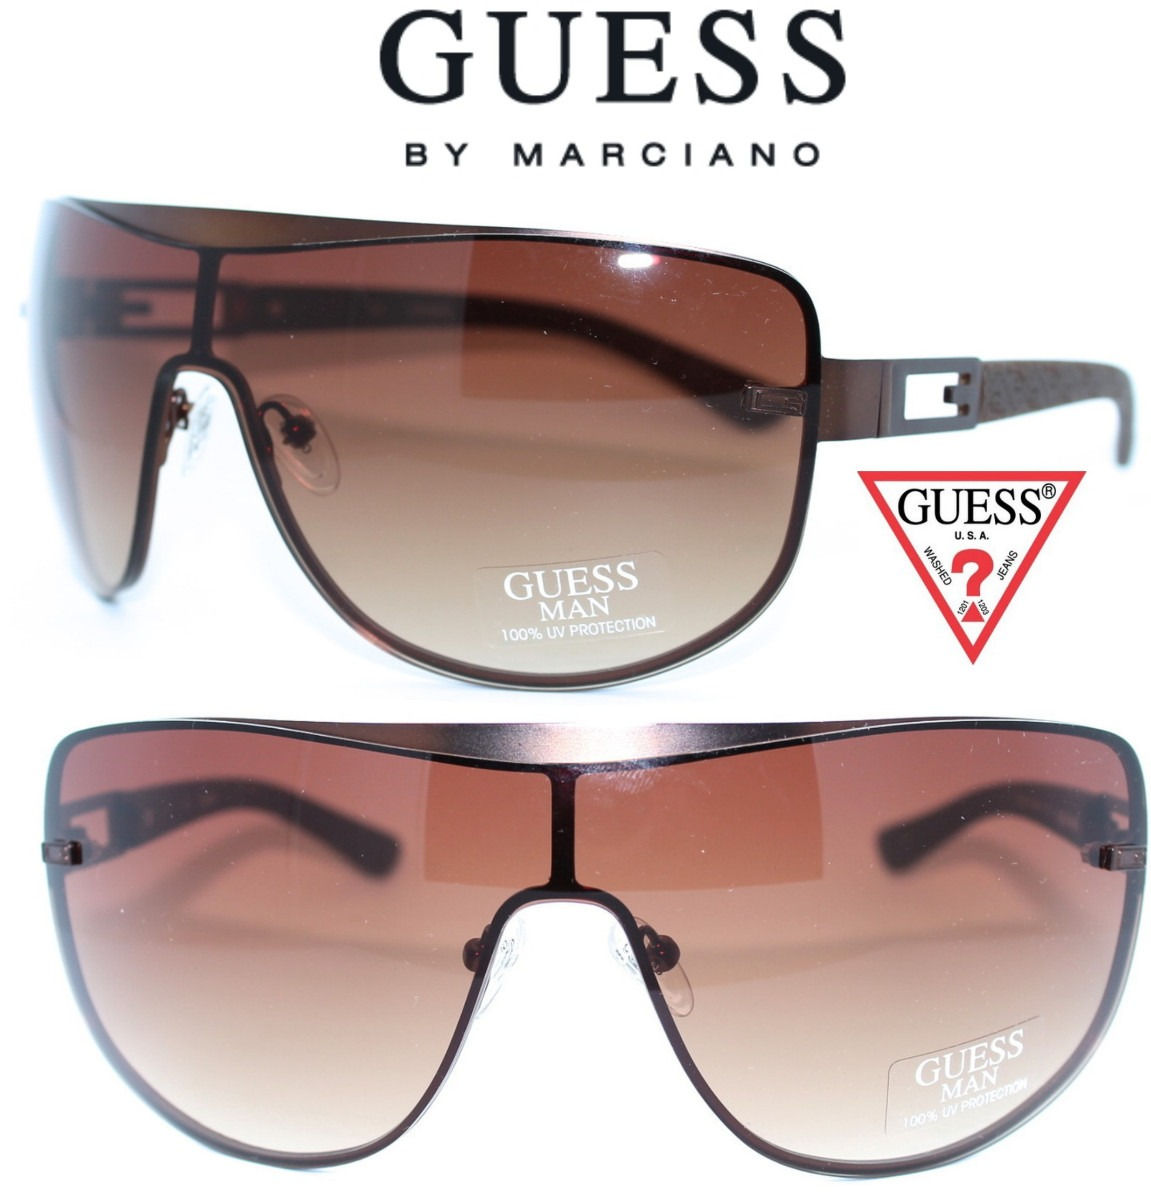 225c60e674 Gafas De Sol Guess Mujer 2017 likr.es